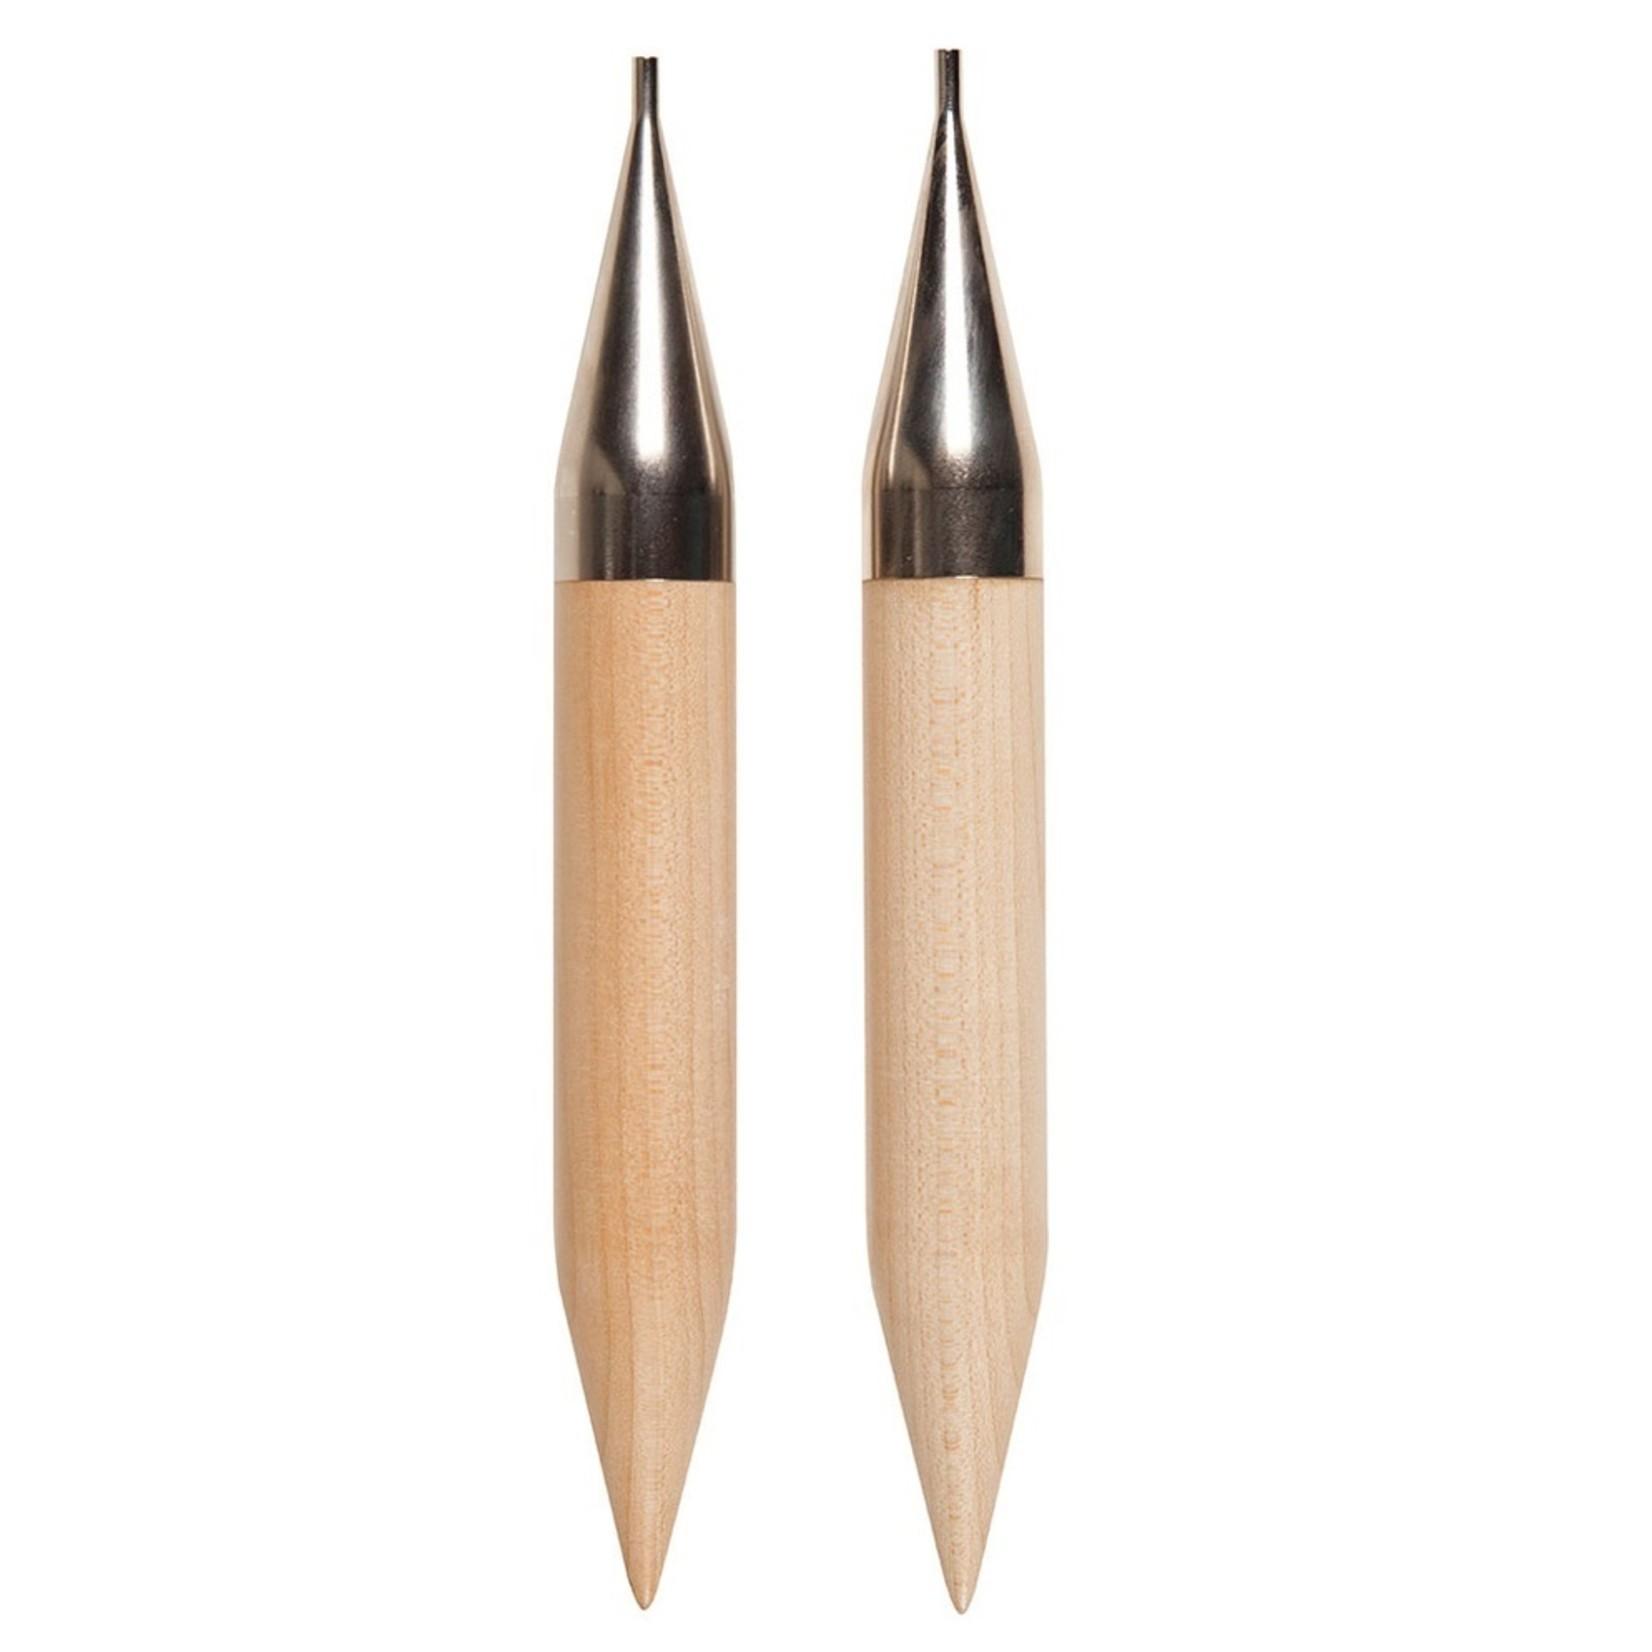 Knit Picks KNIT PICKS Birch Wood Interchangeable Circular Needle Tips